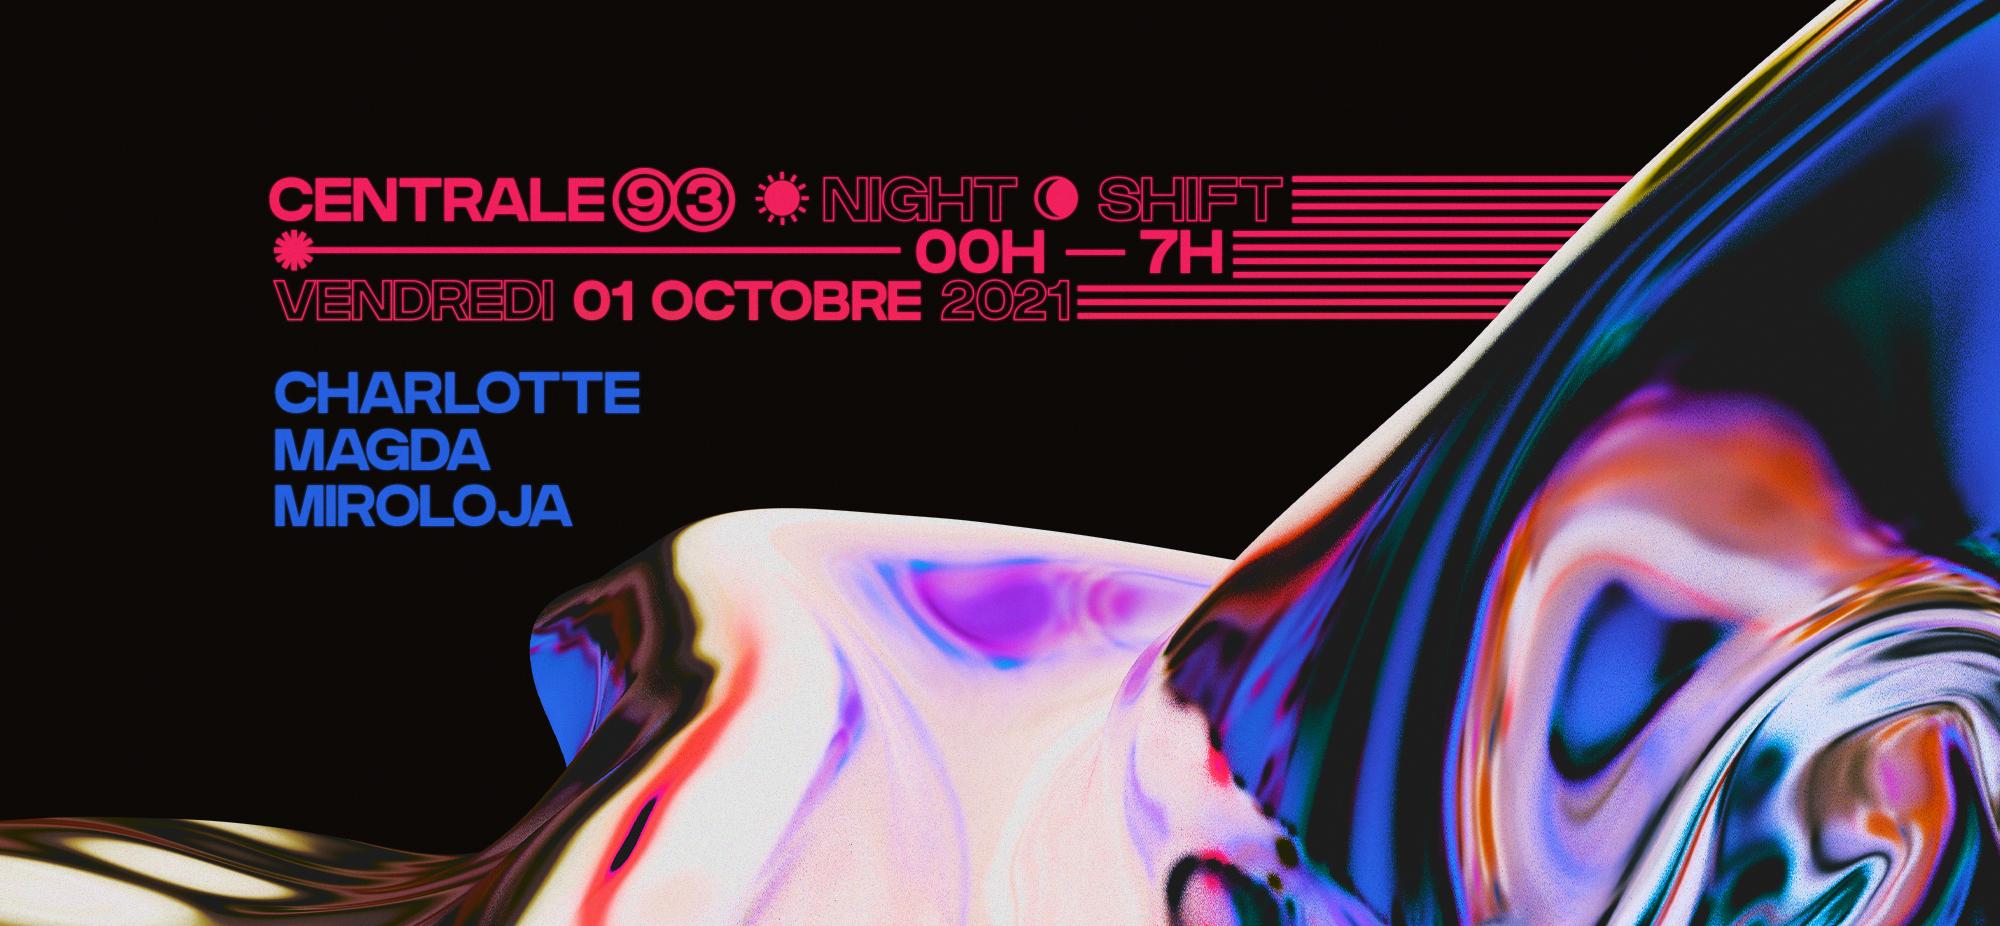 Nightshift @ Centrale 93 : Magda, Miroloja, Charlotte